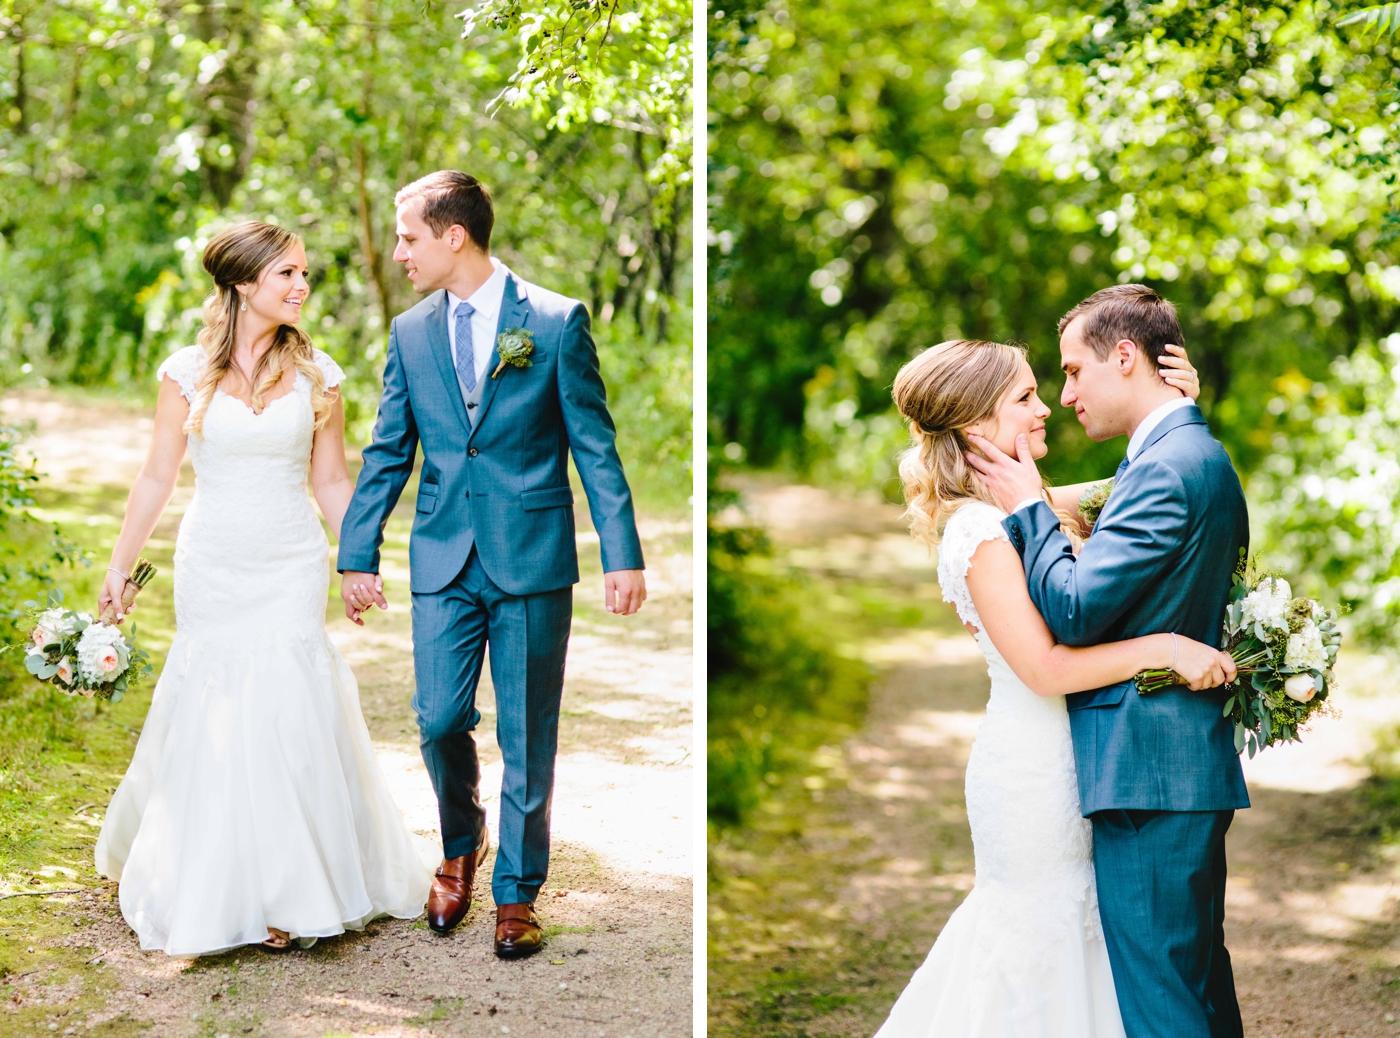 chicago-fine-art-wedding-photography-chiapetta34